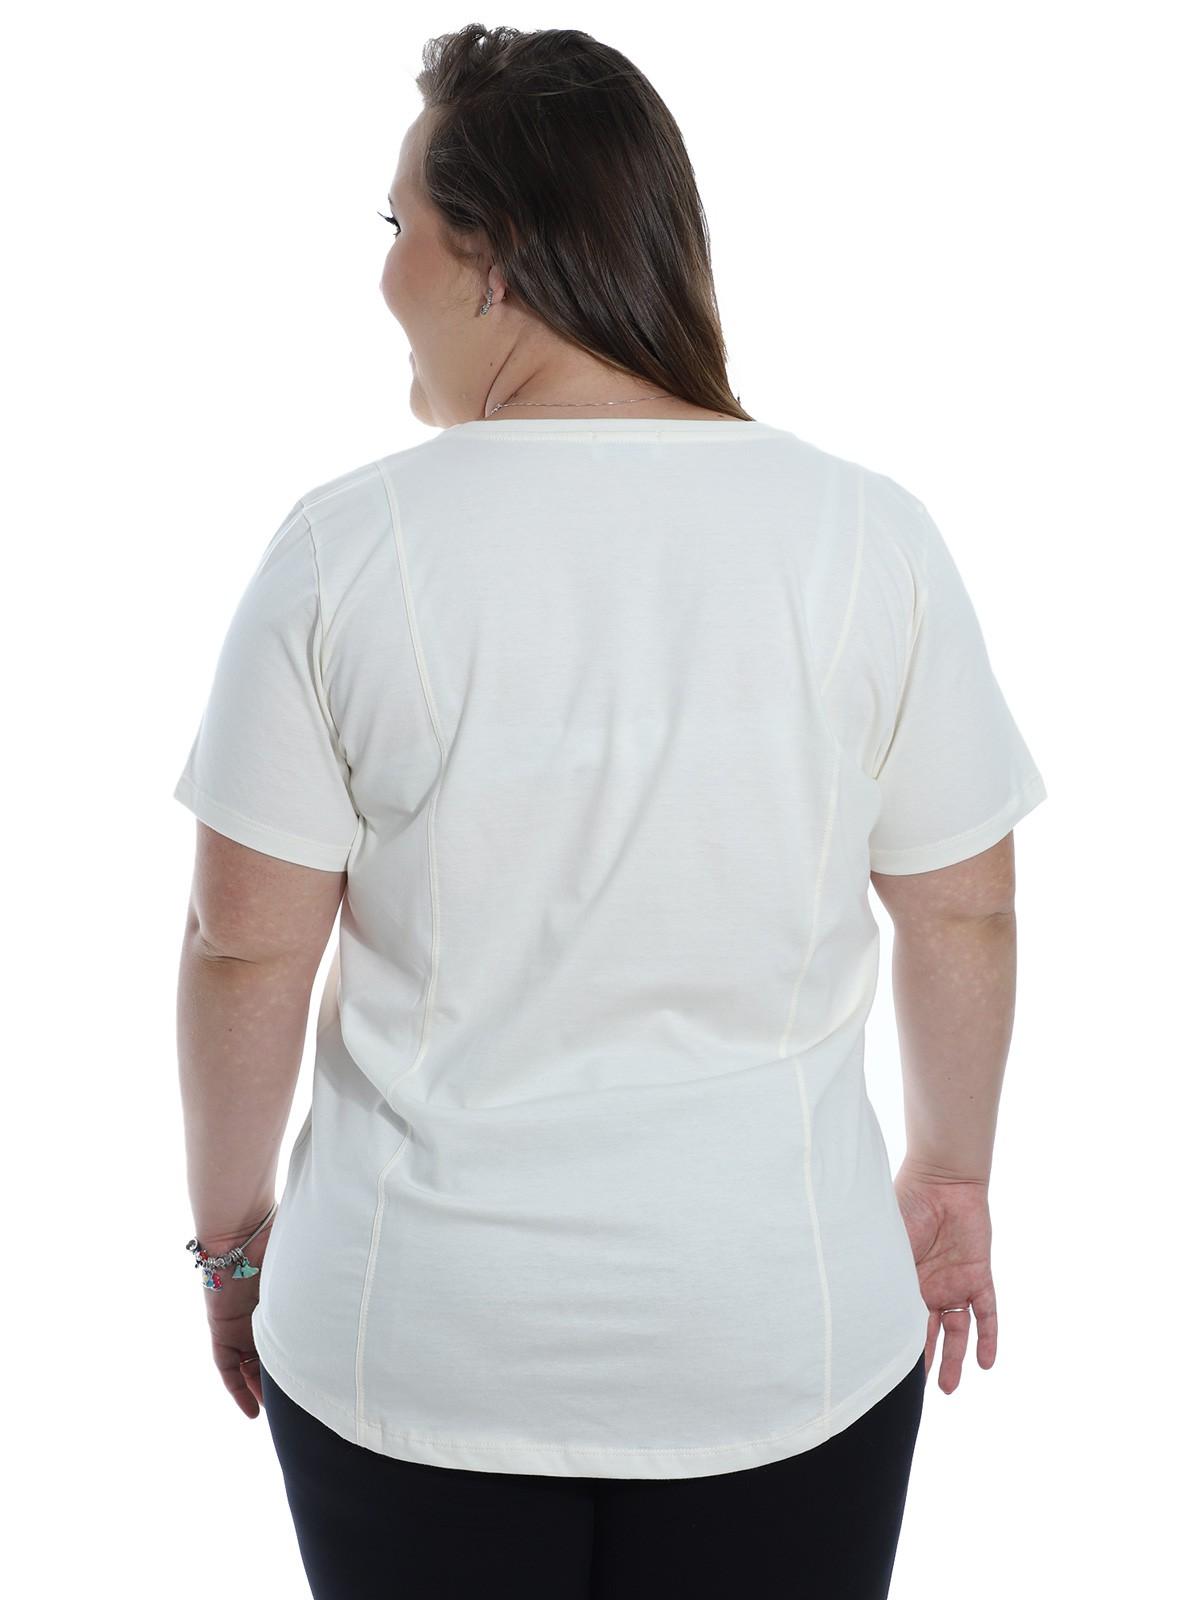 Blusa Plus Size KTS com Estampa Areia